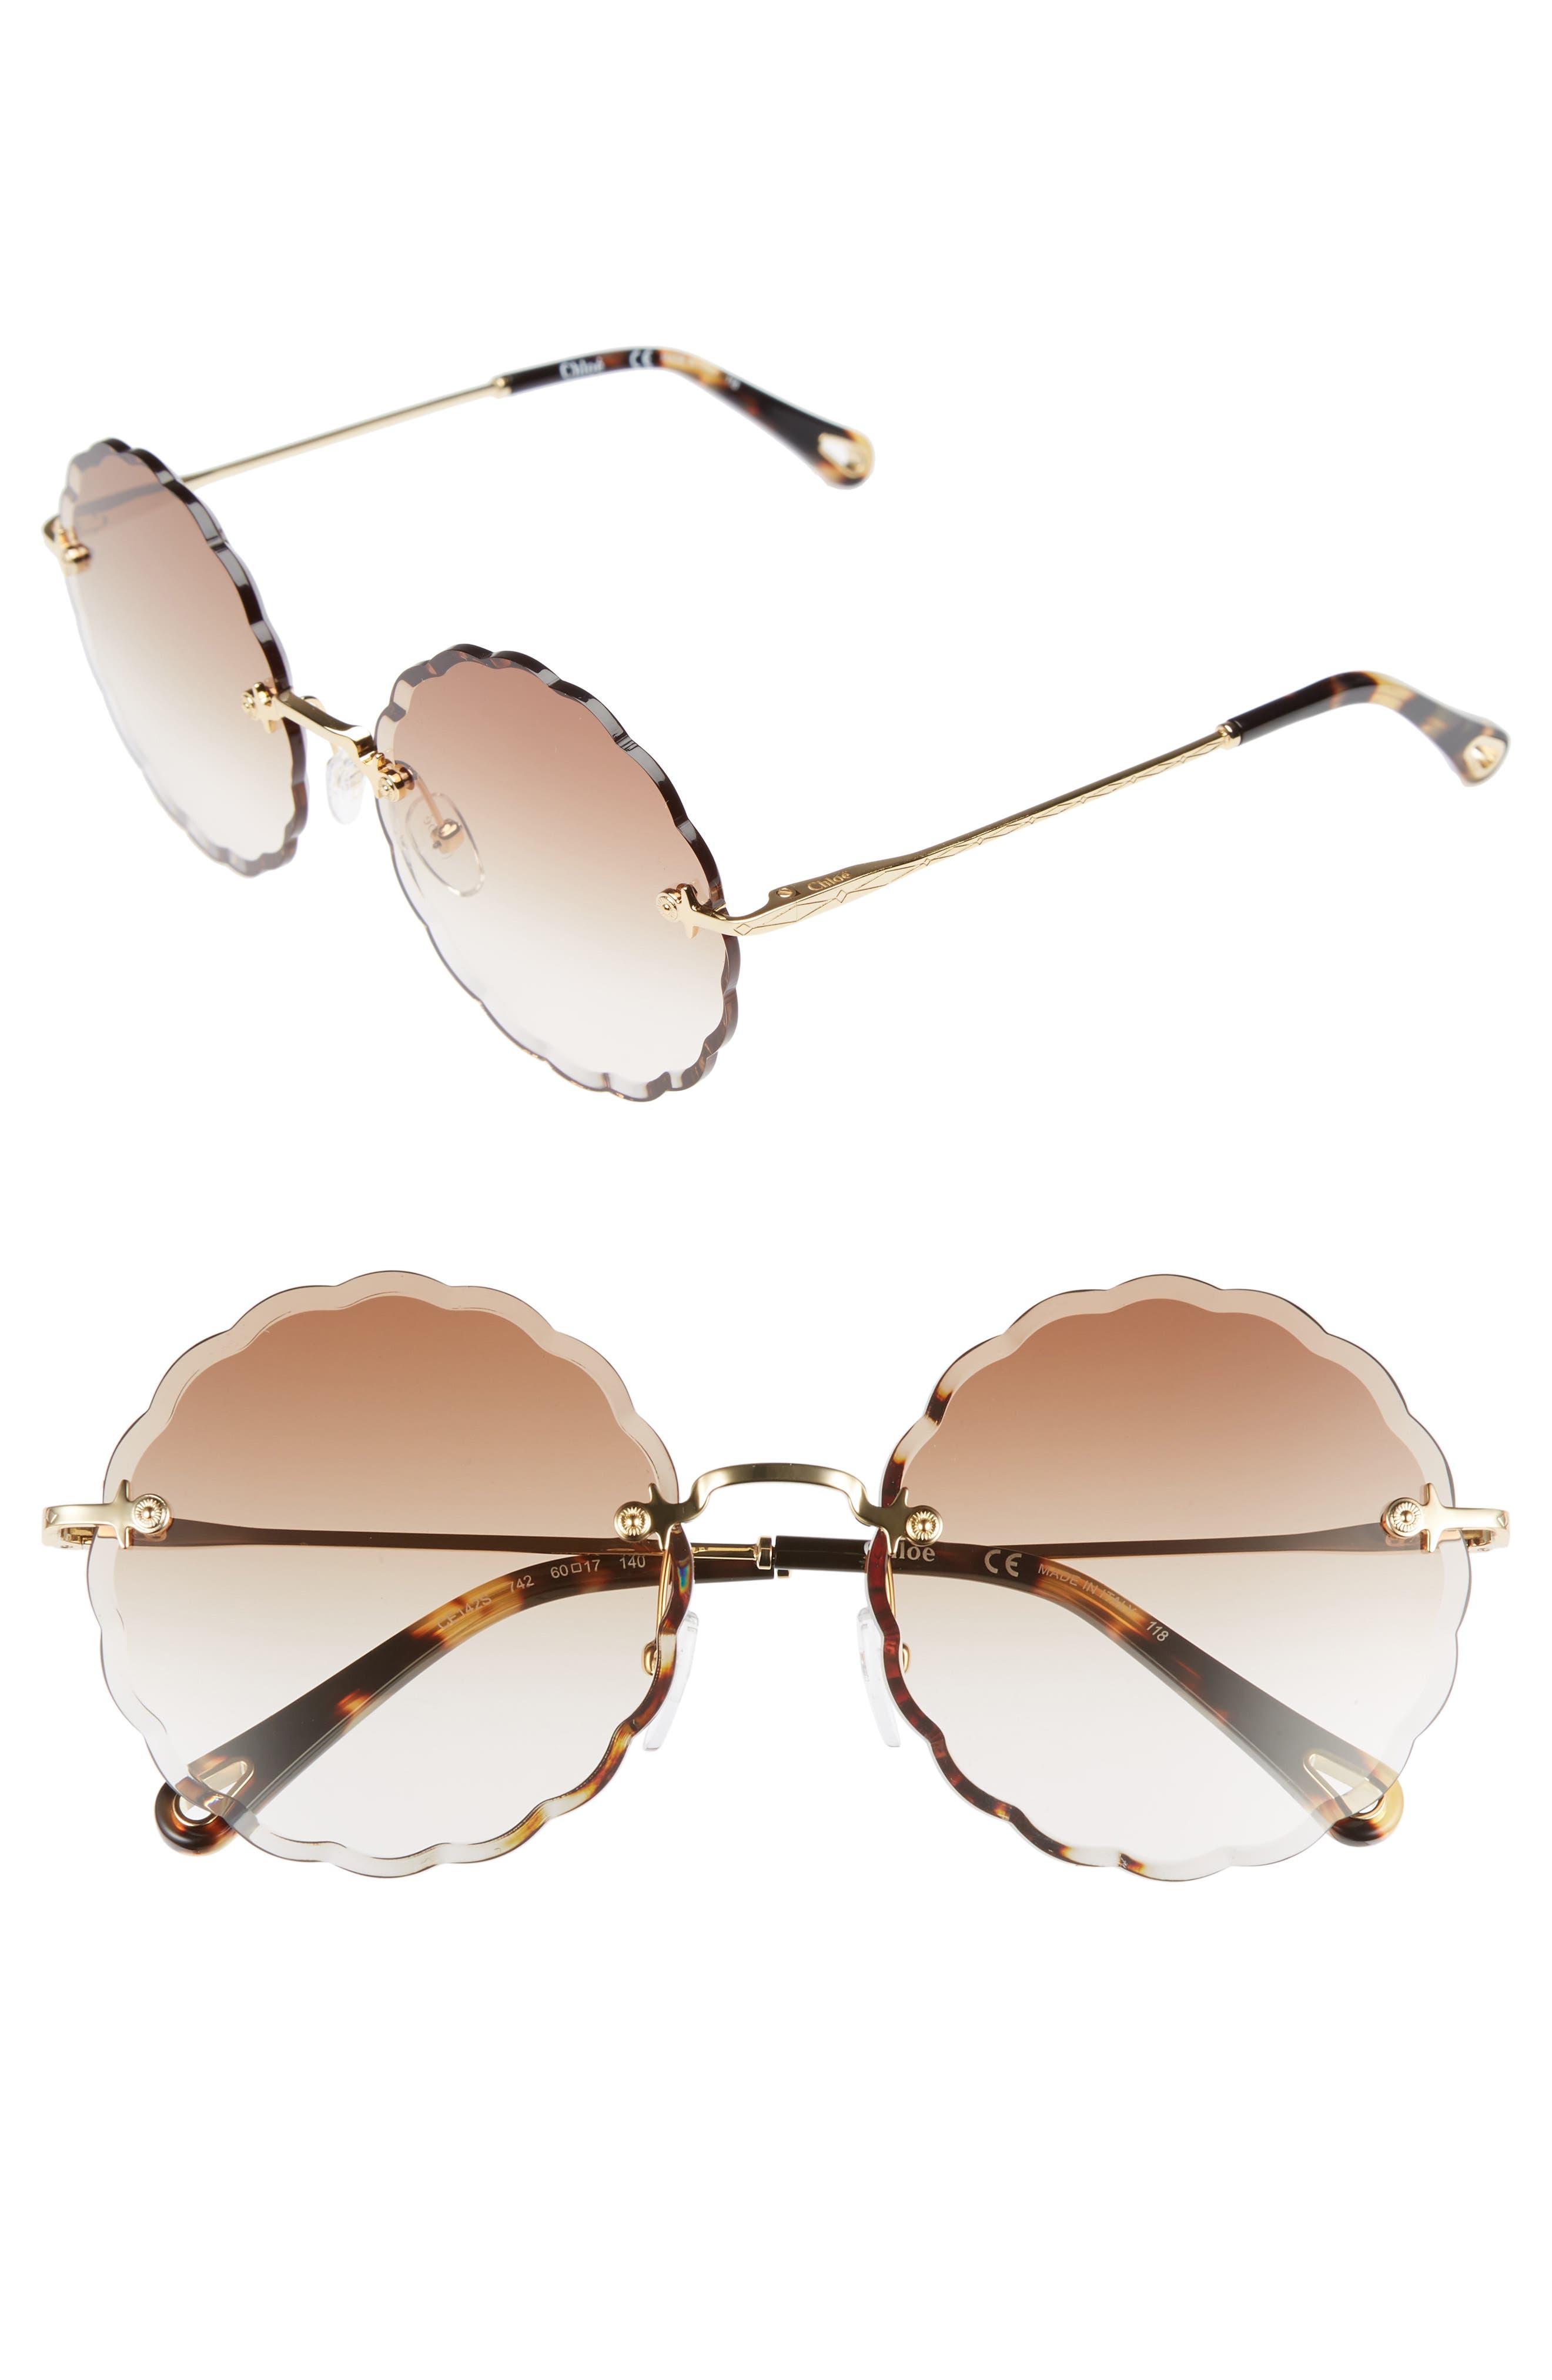 2bc8da04b9bb Chloé Sunglasses for Women